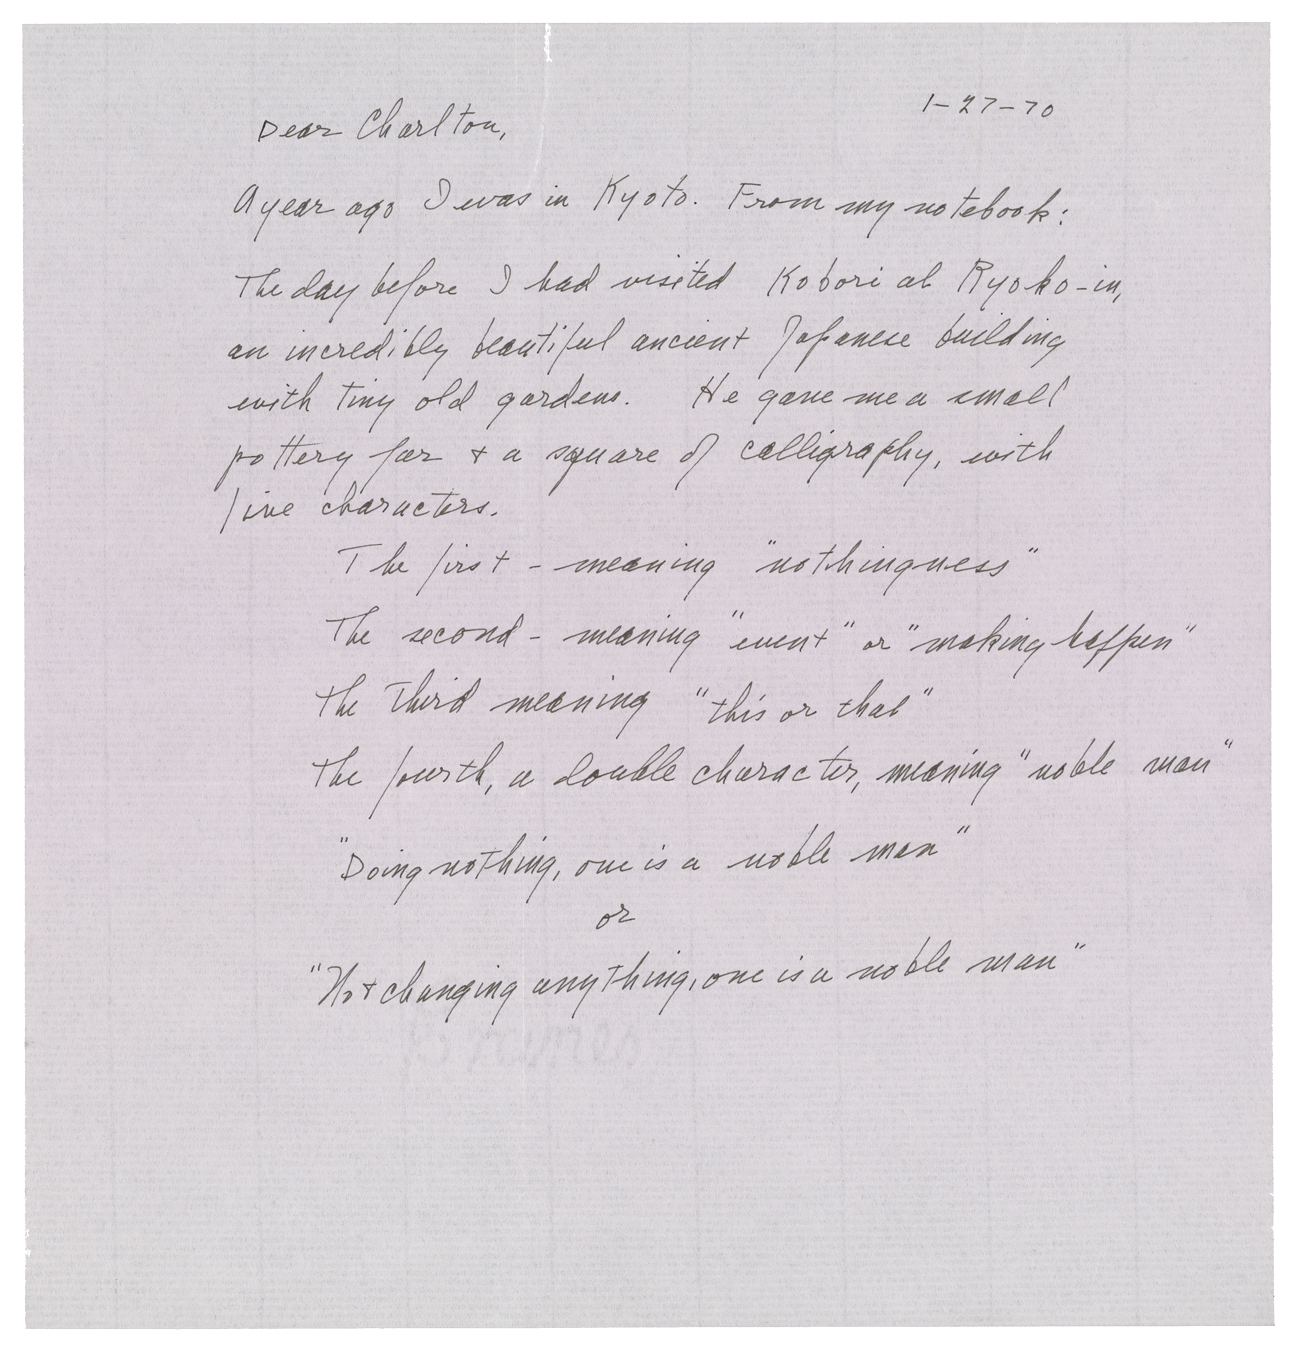 Lenore Tawney (142-3), letter to Maryette Charlton, Jan. 27, 1970 [cont'd below]